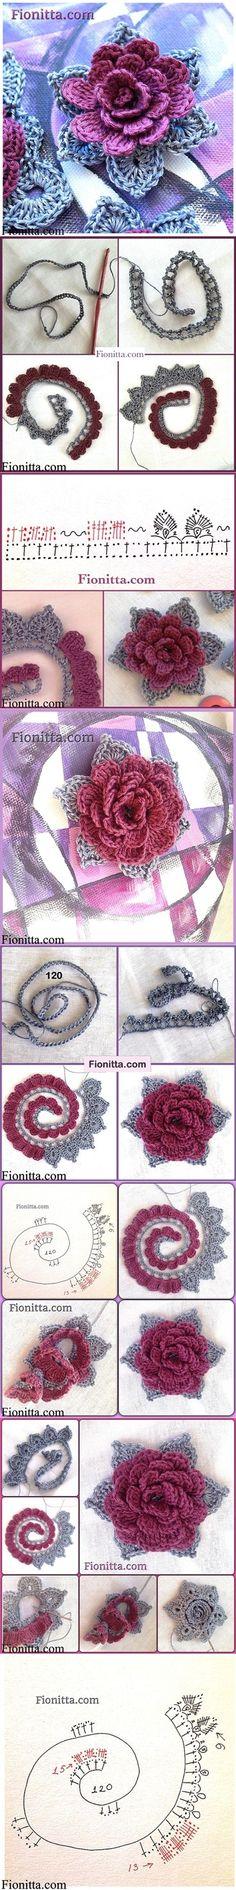 www.crochetkingdom.com wp-content uploads 2014 11 crochet-rose-3d.jpg